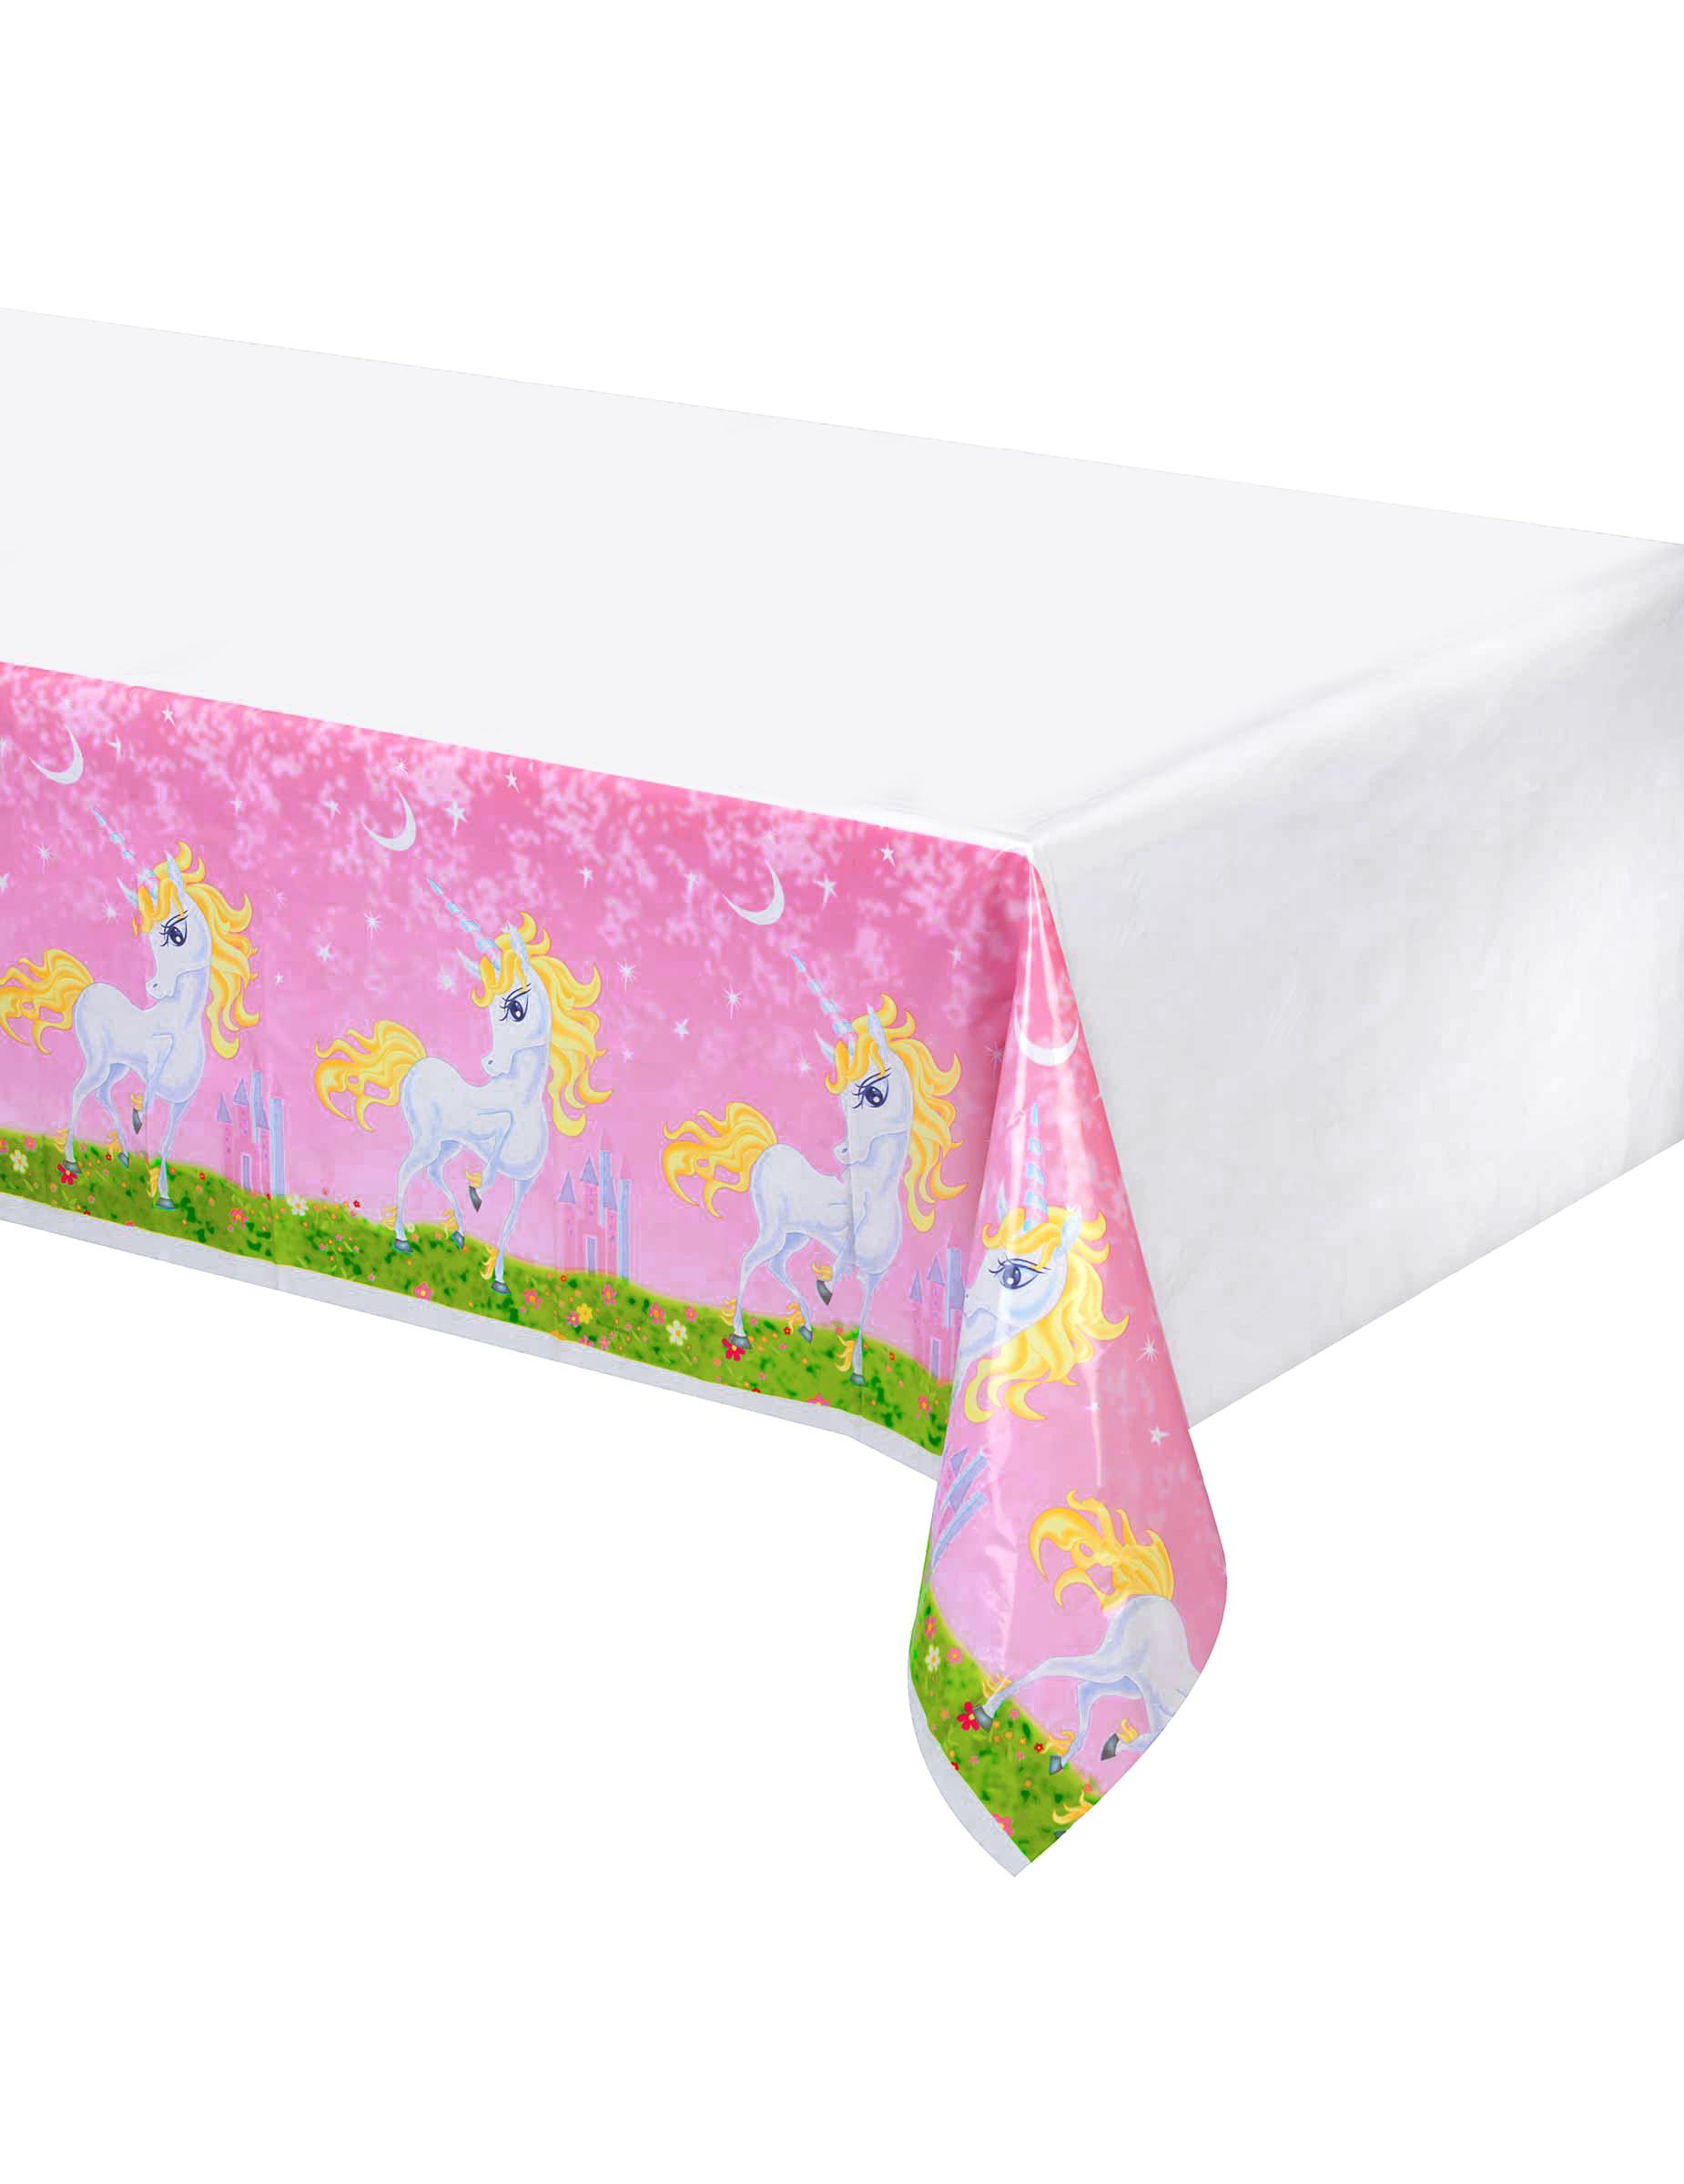 Mantel de pl stico unicornio girly 130x180 cm decoraci n for Decoracion para pared de unicornio